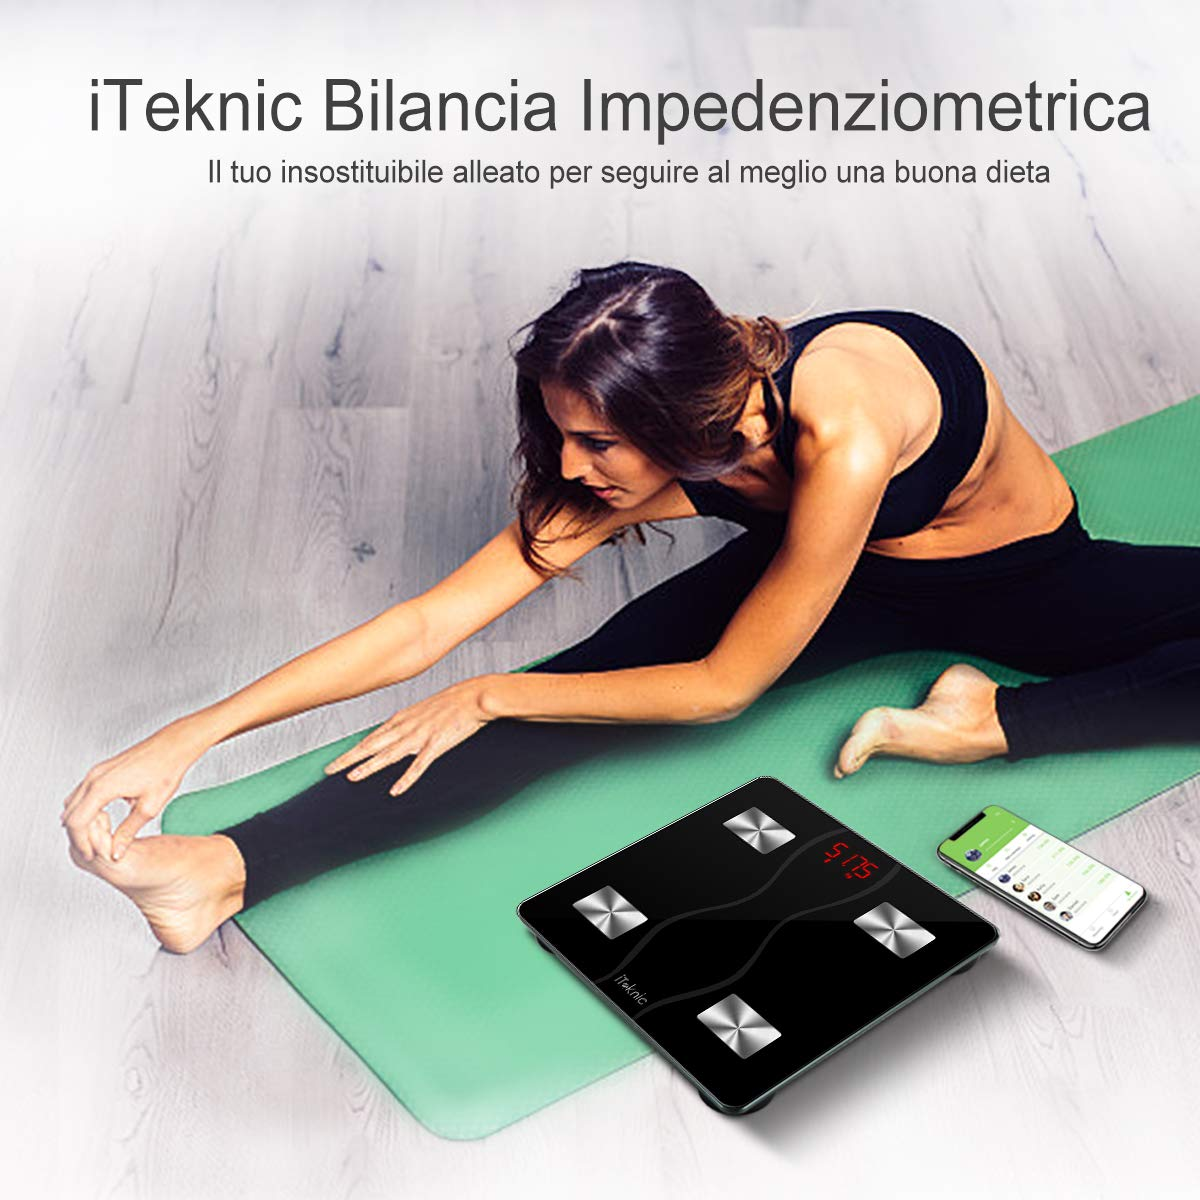 iteknic bilancia impedenziometrica  Bilancia Impedenziometrica iTeknic Bilancia Pesa Persona Digitale ...